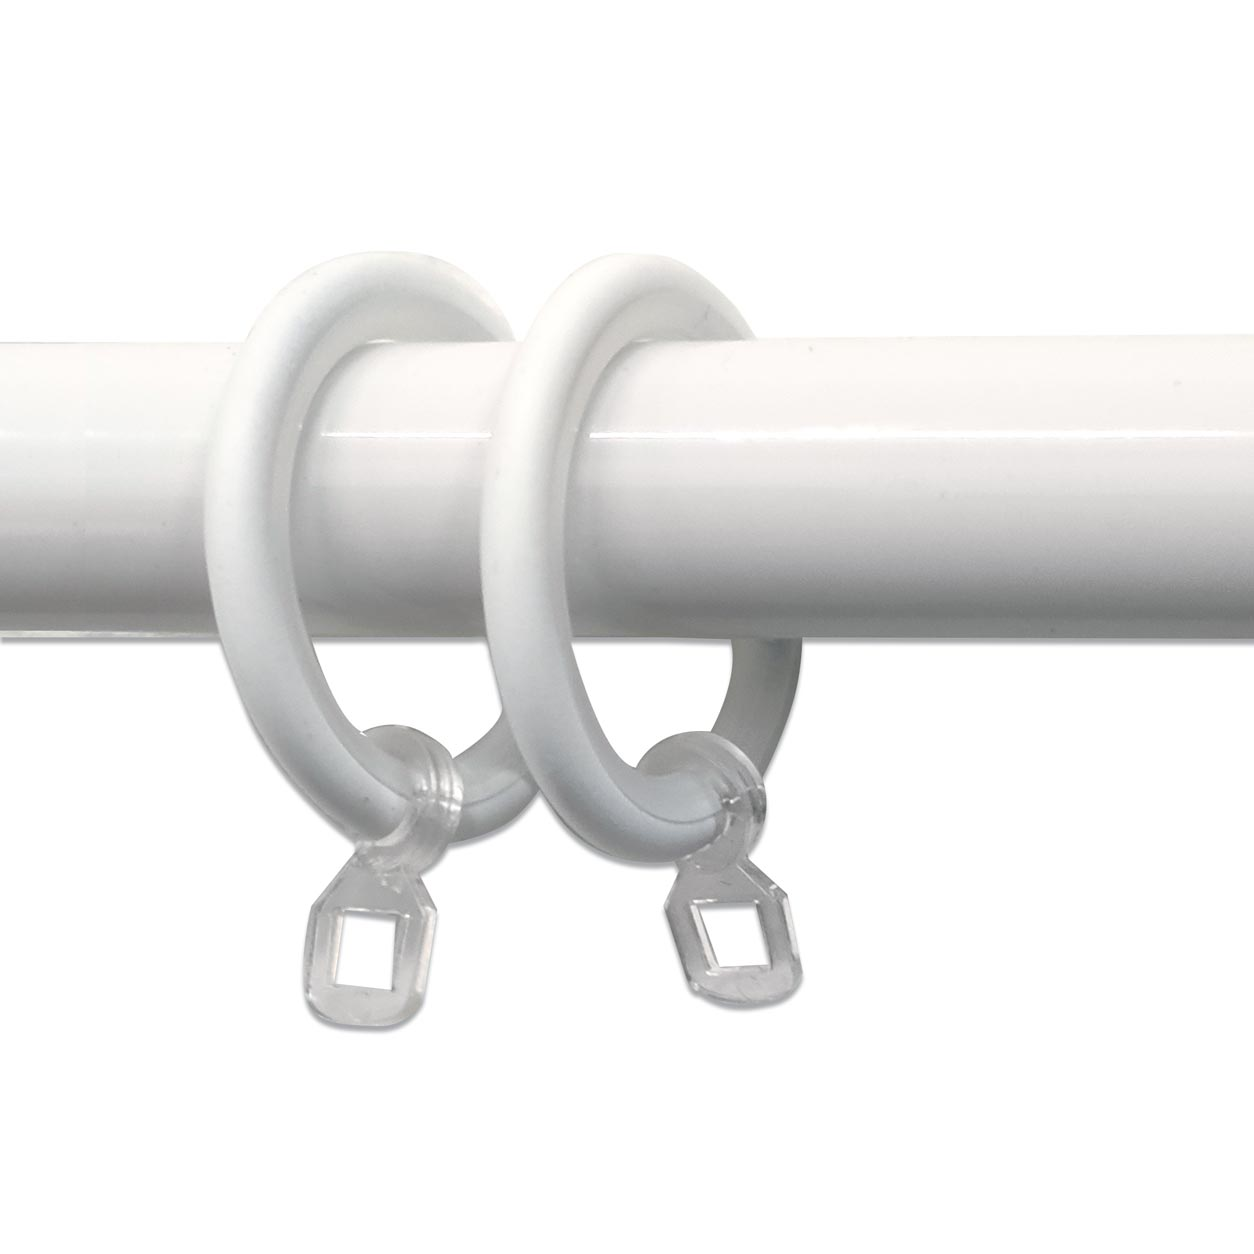 Anelli per Bastoni Diametro 26 mm - Bianco - 10 pz